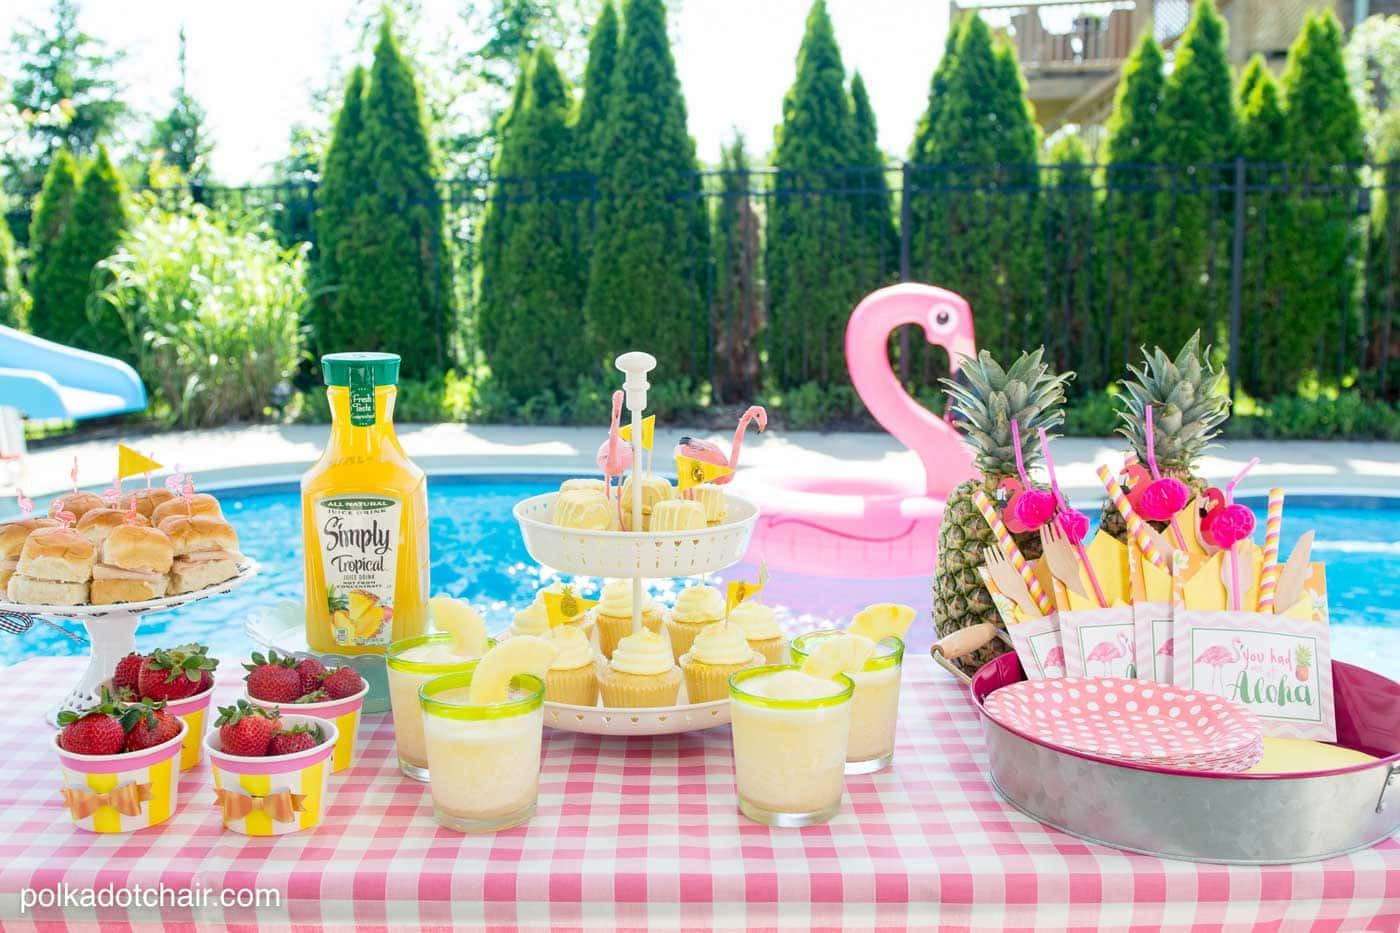 Pool Party Decorations Ideas  Summer Backyard Flamingo Pool Party Ideas The Polka Dot